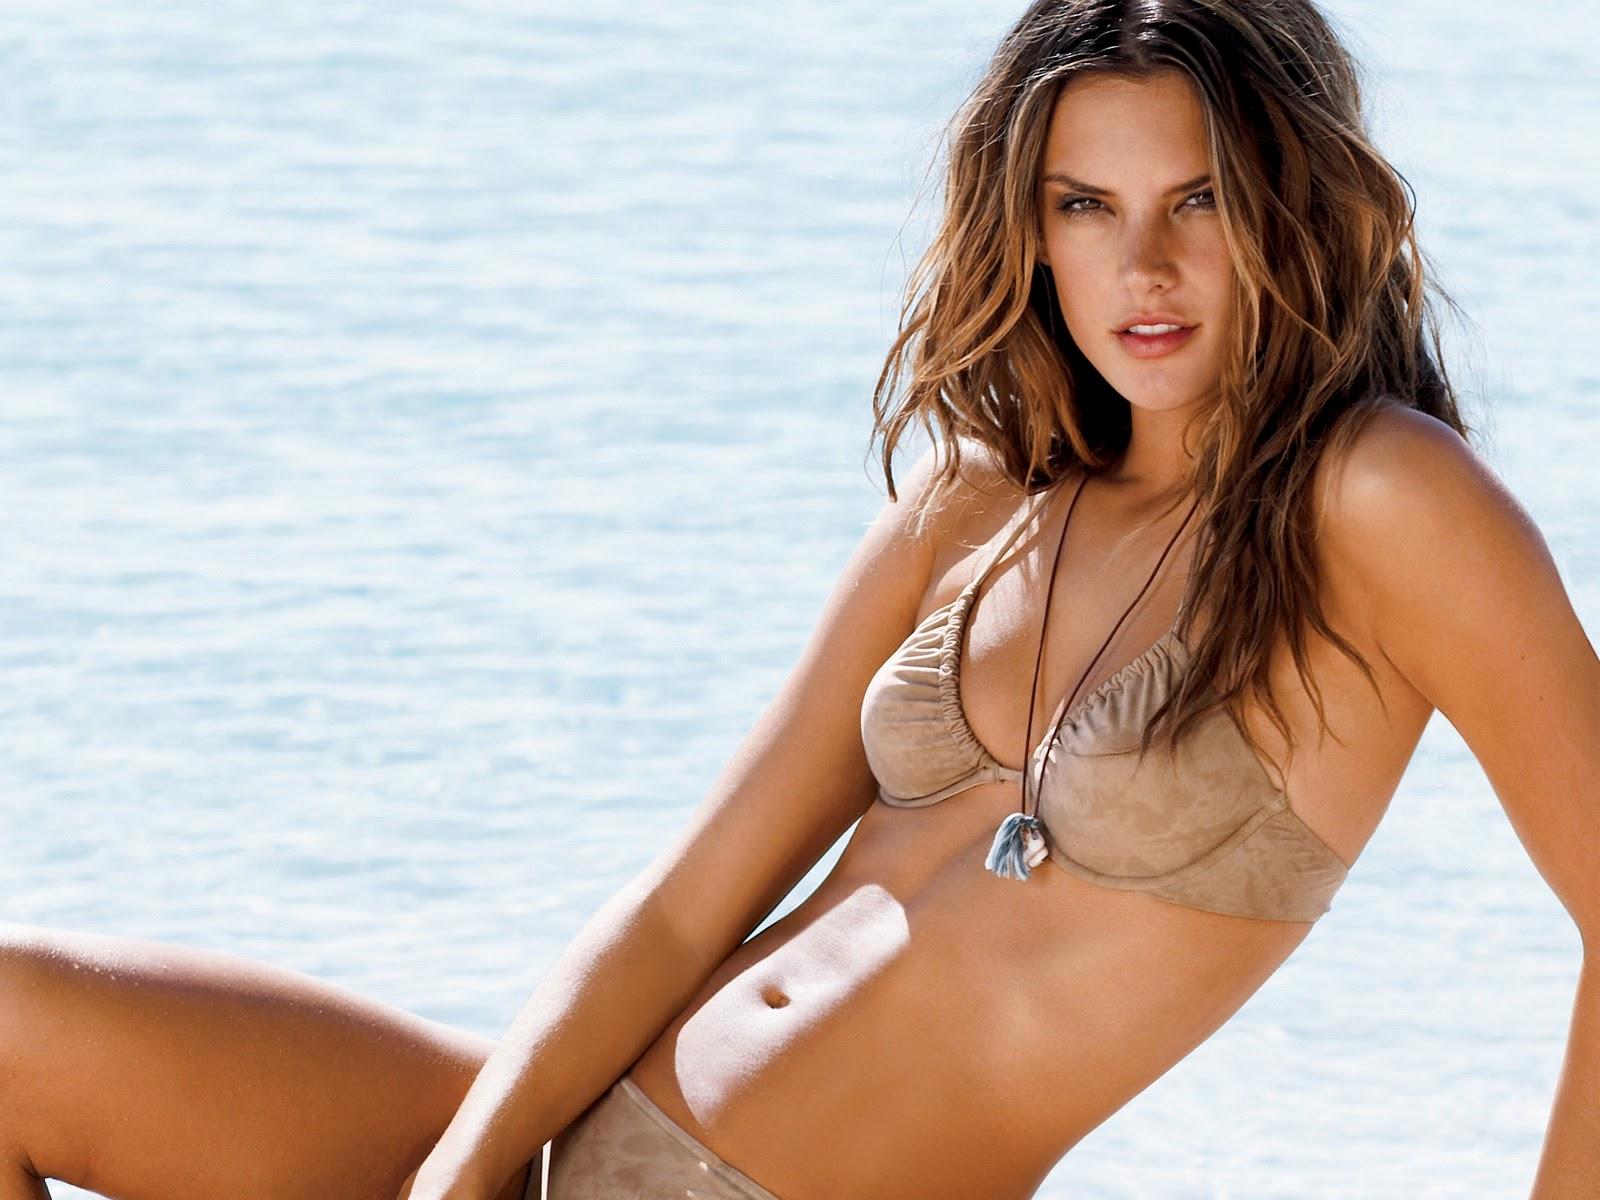 http://4.bp.blogspot.com/-F3ORCz-fnjI/TnWUfiVMlOI/AAAAAAAAA5M/sP-0SG7LO78/s1600/Alessandra-Ambrosio-Sexy-In-Bikini-Wallpaper.jpg